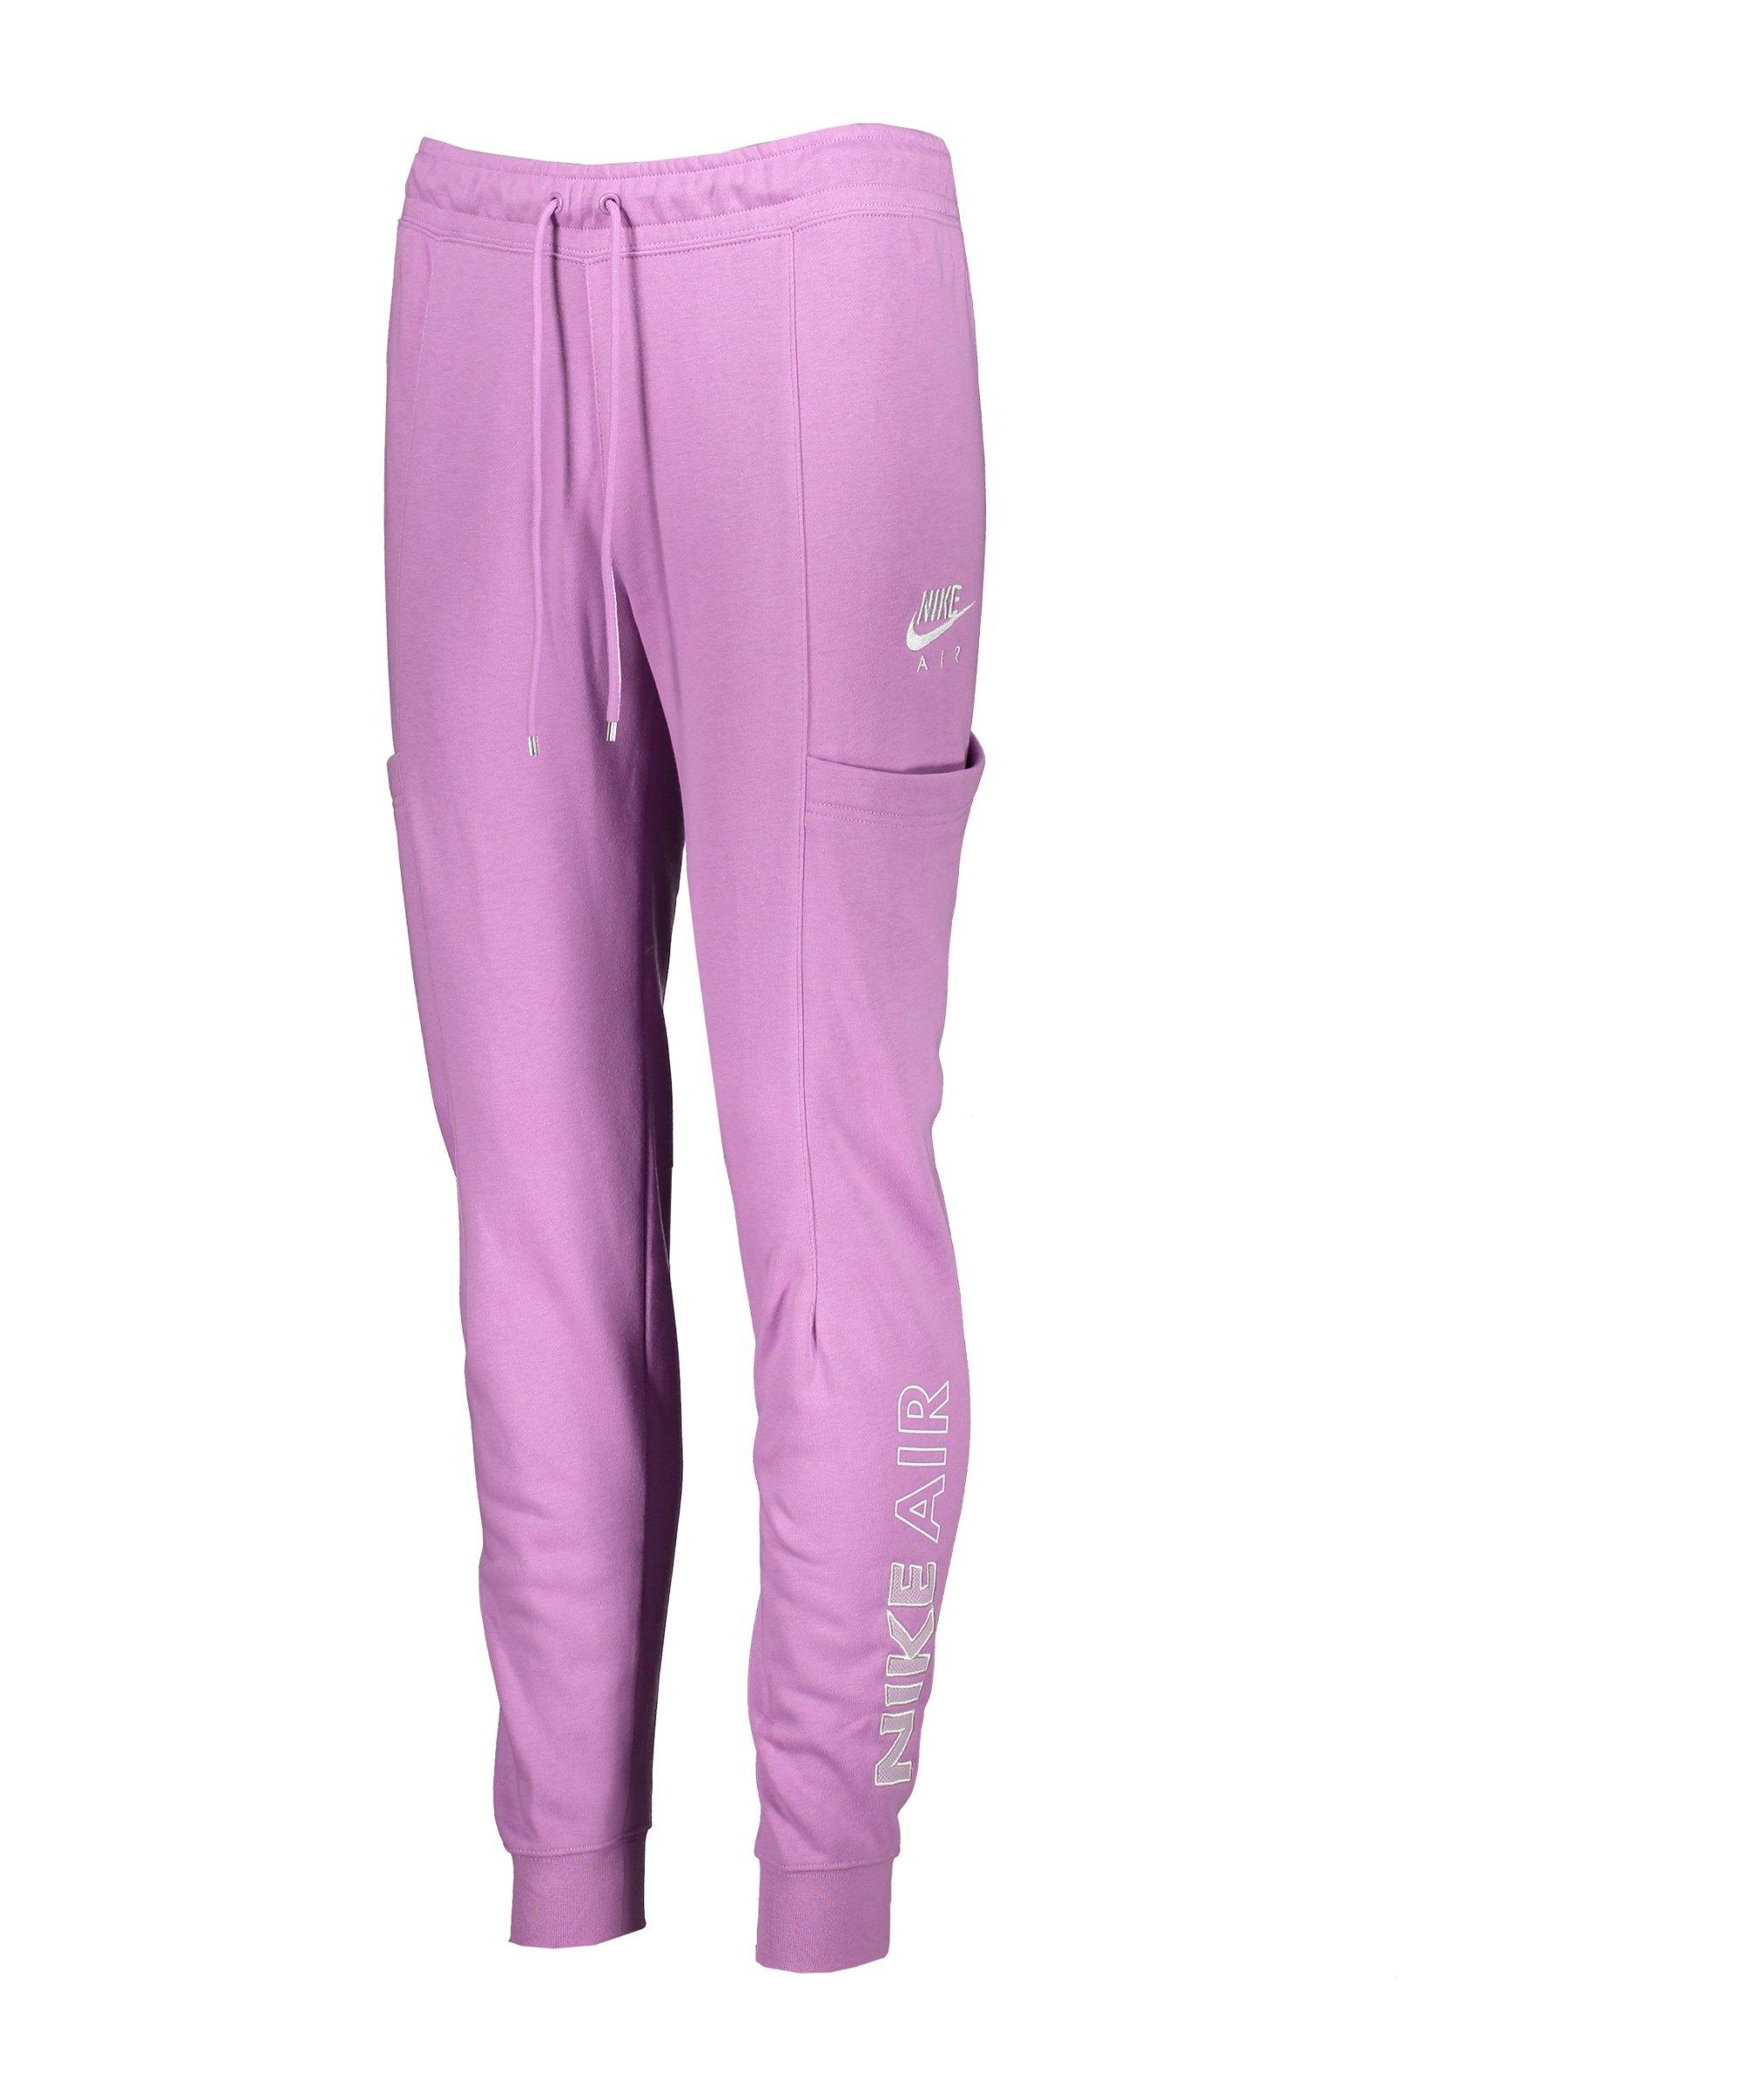 Nike Air Jogginghose Damen Lila Weiss F591 - lila